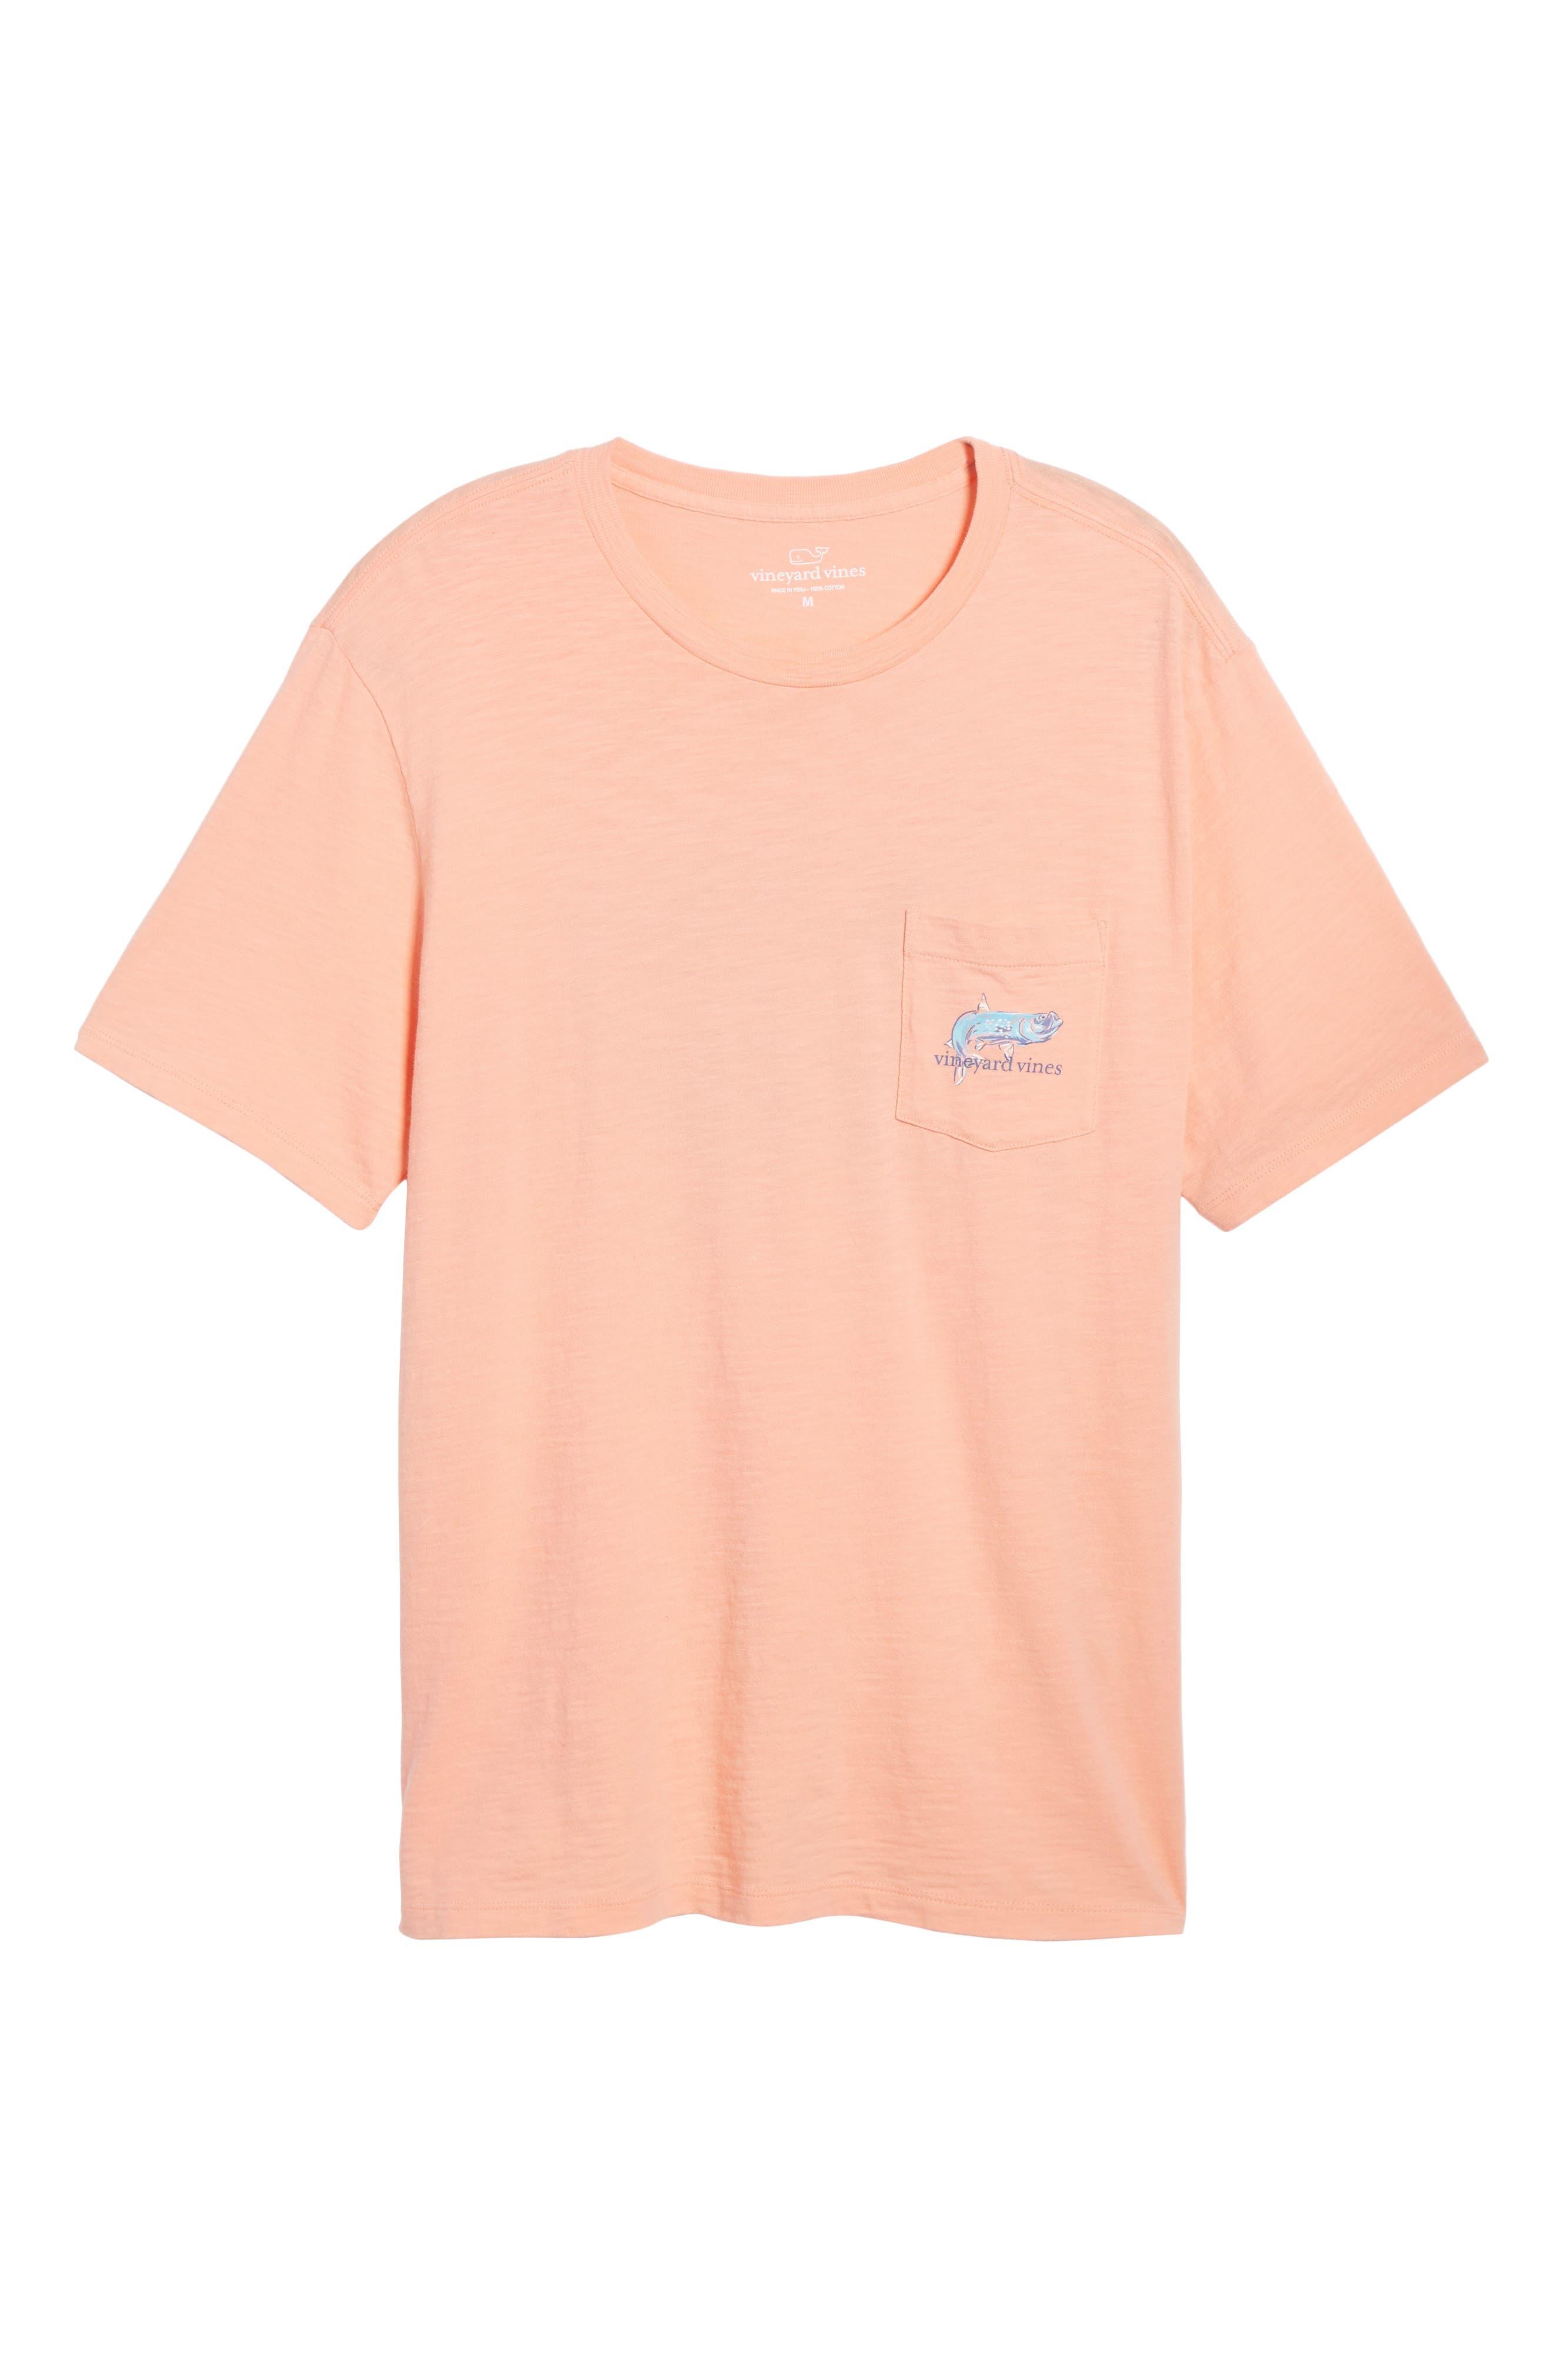 Painted Tarpon Graphic Pocket T-Shirt,                             Alternate thumbnail 6, color,                             821